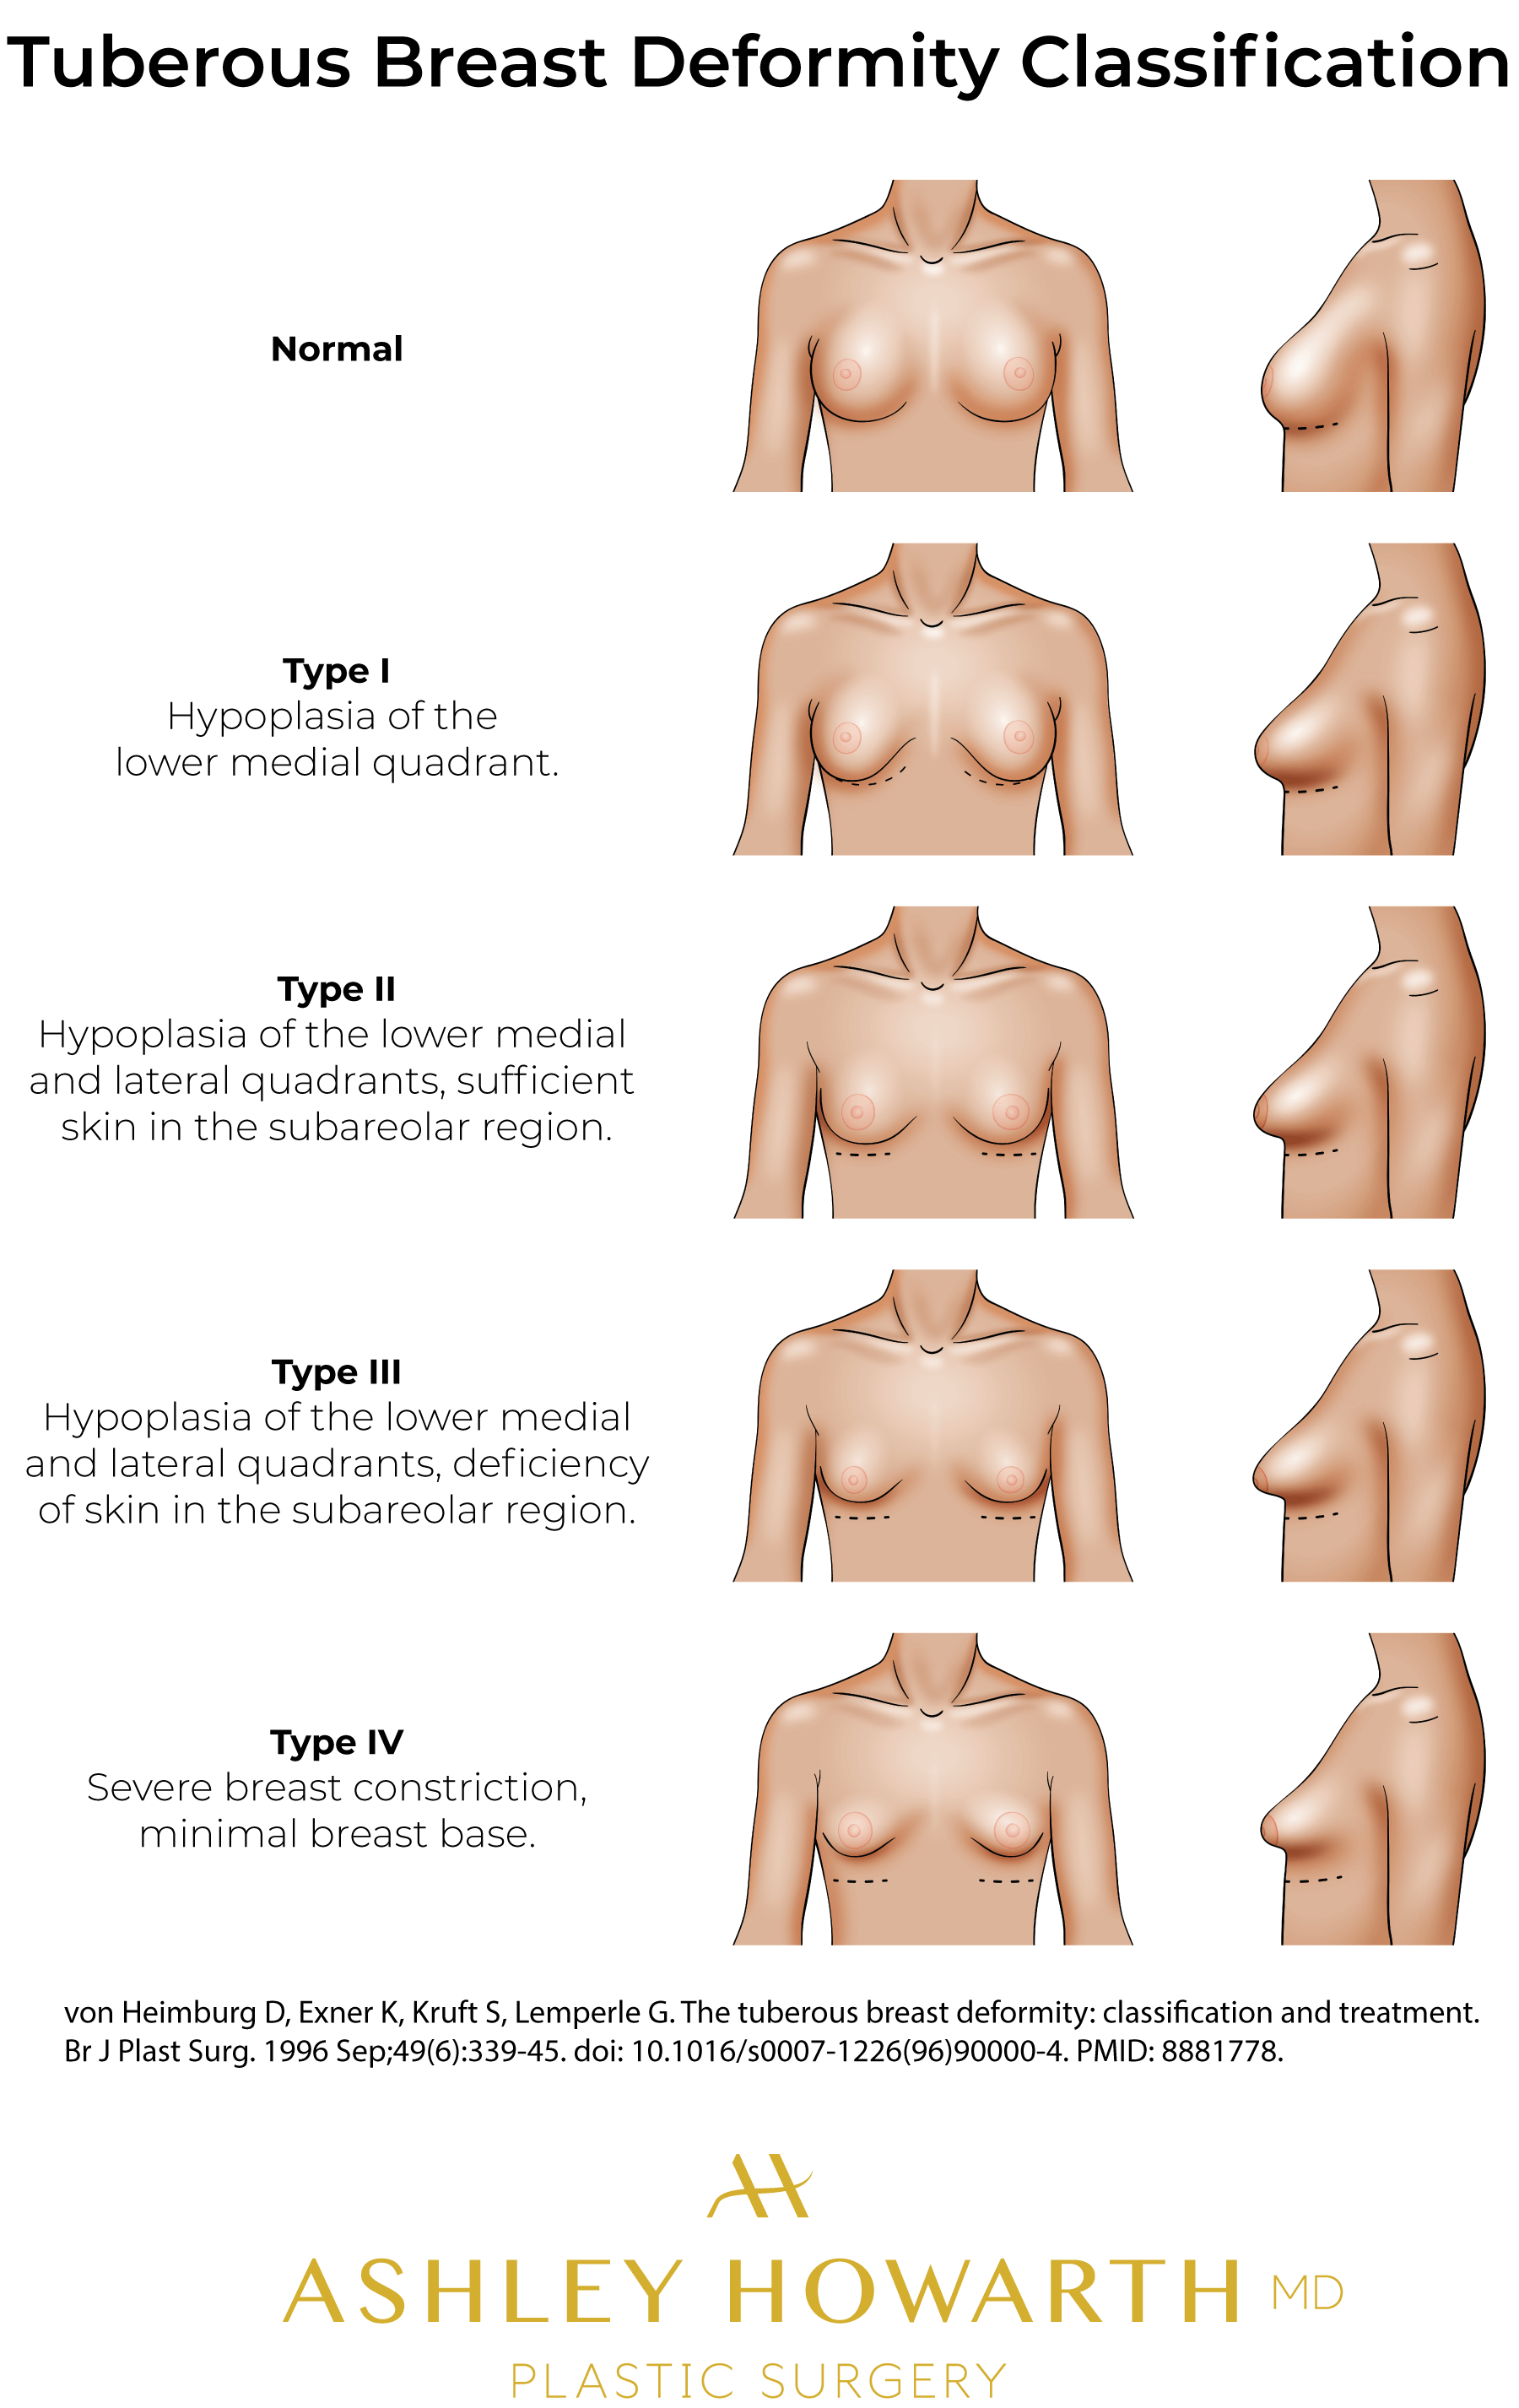 Tubular Breasts - Tuberous Breast Deformity Classification